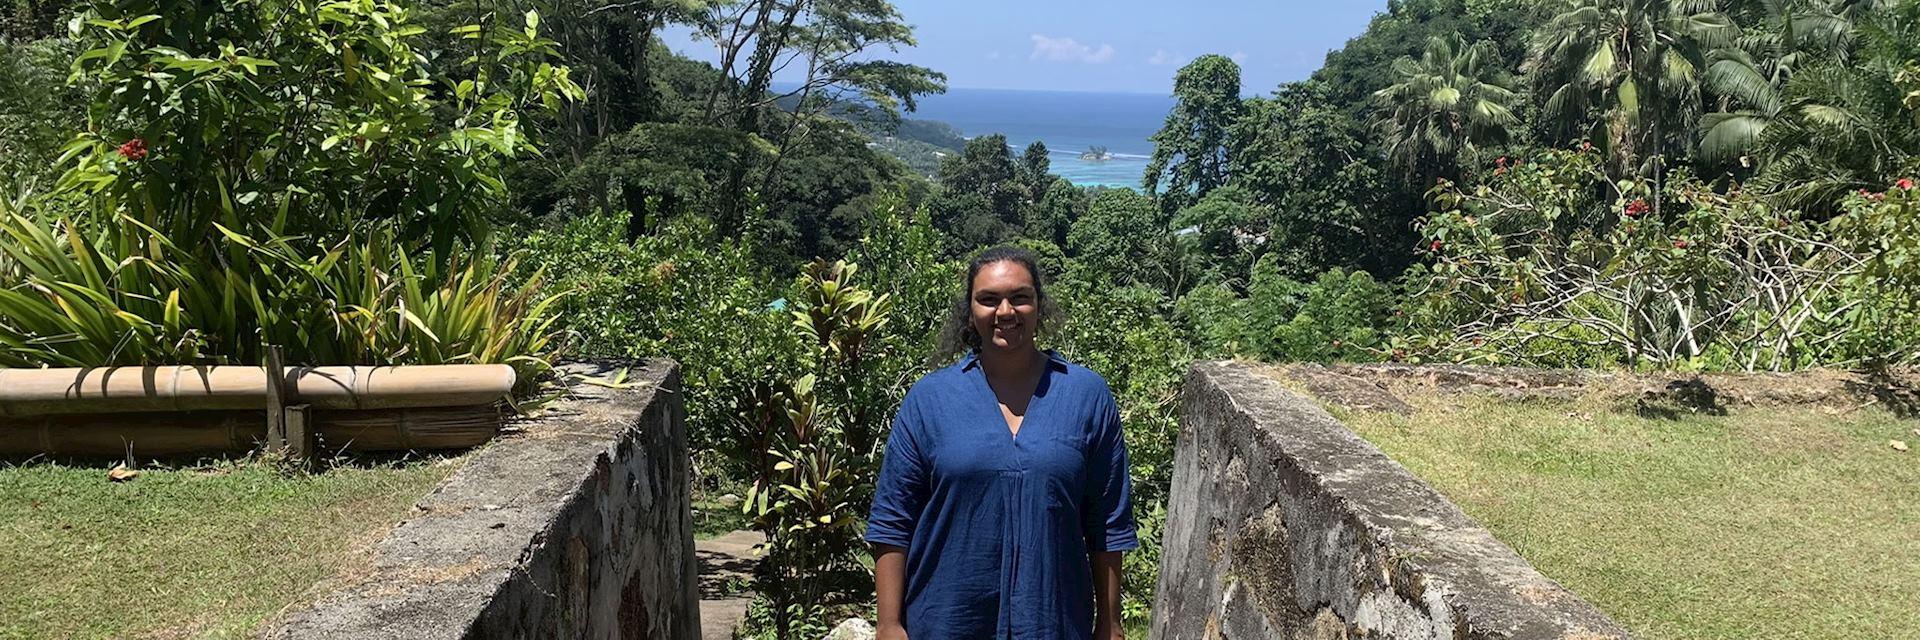 Alisha on Mahé, Seychelles